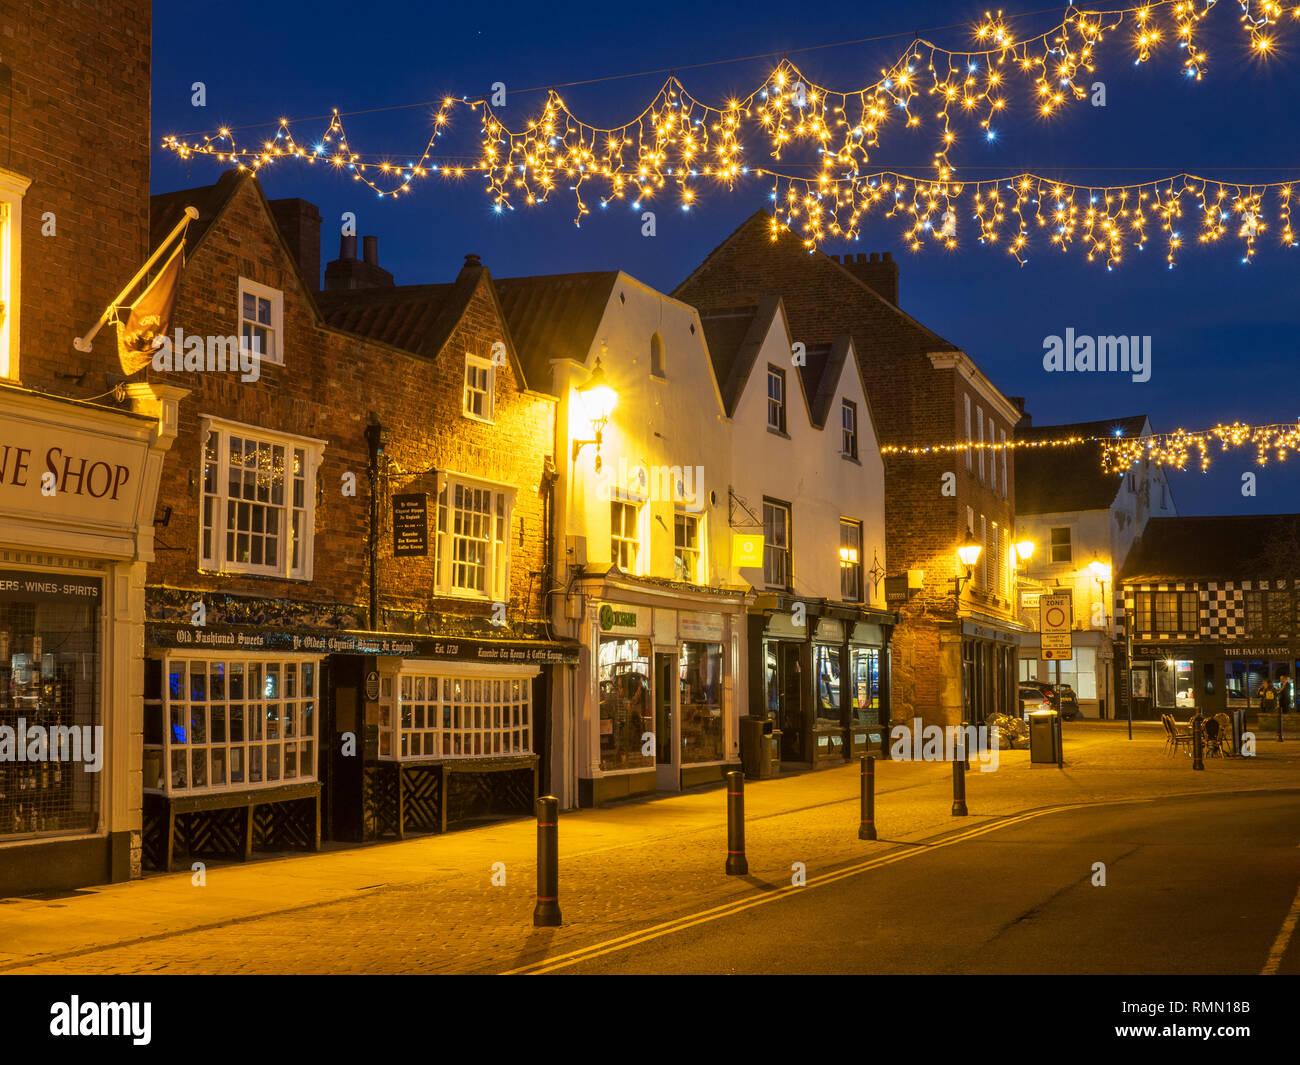 Oldest Chemist Shop in England in the Market Place at dusk Knaresborough North Yorkshire England - Stock Image